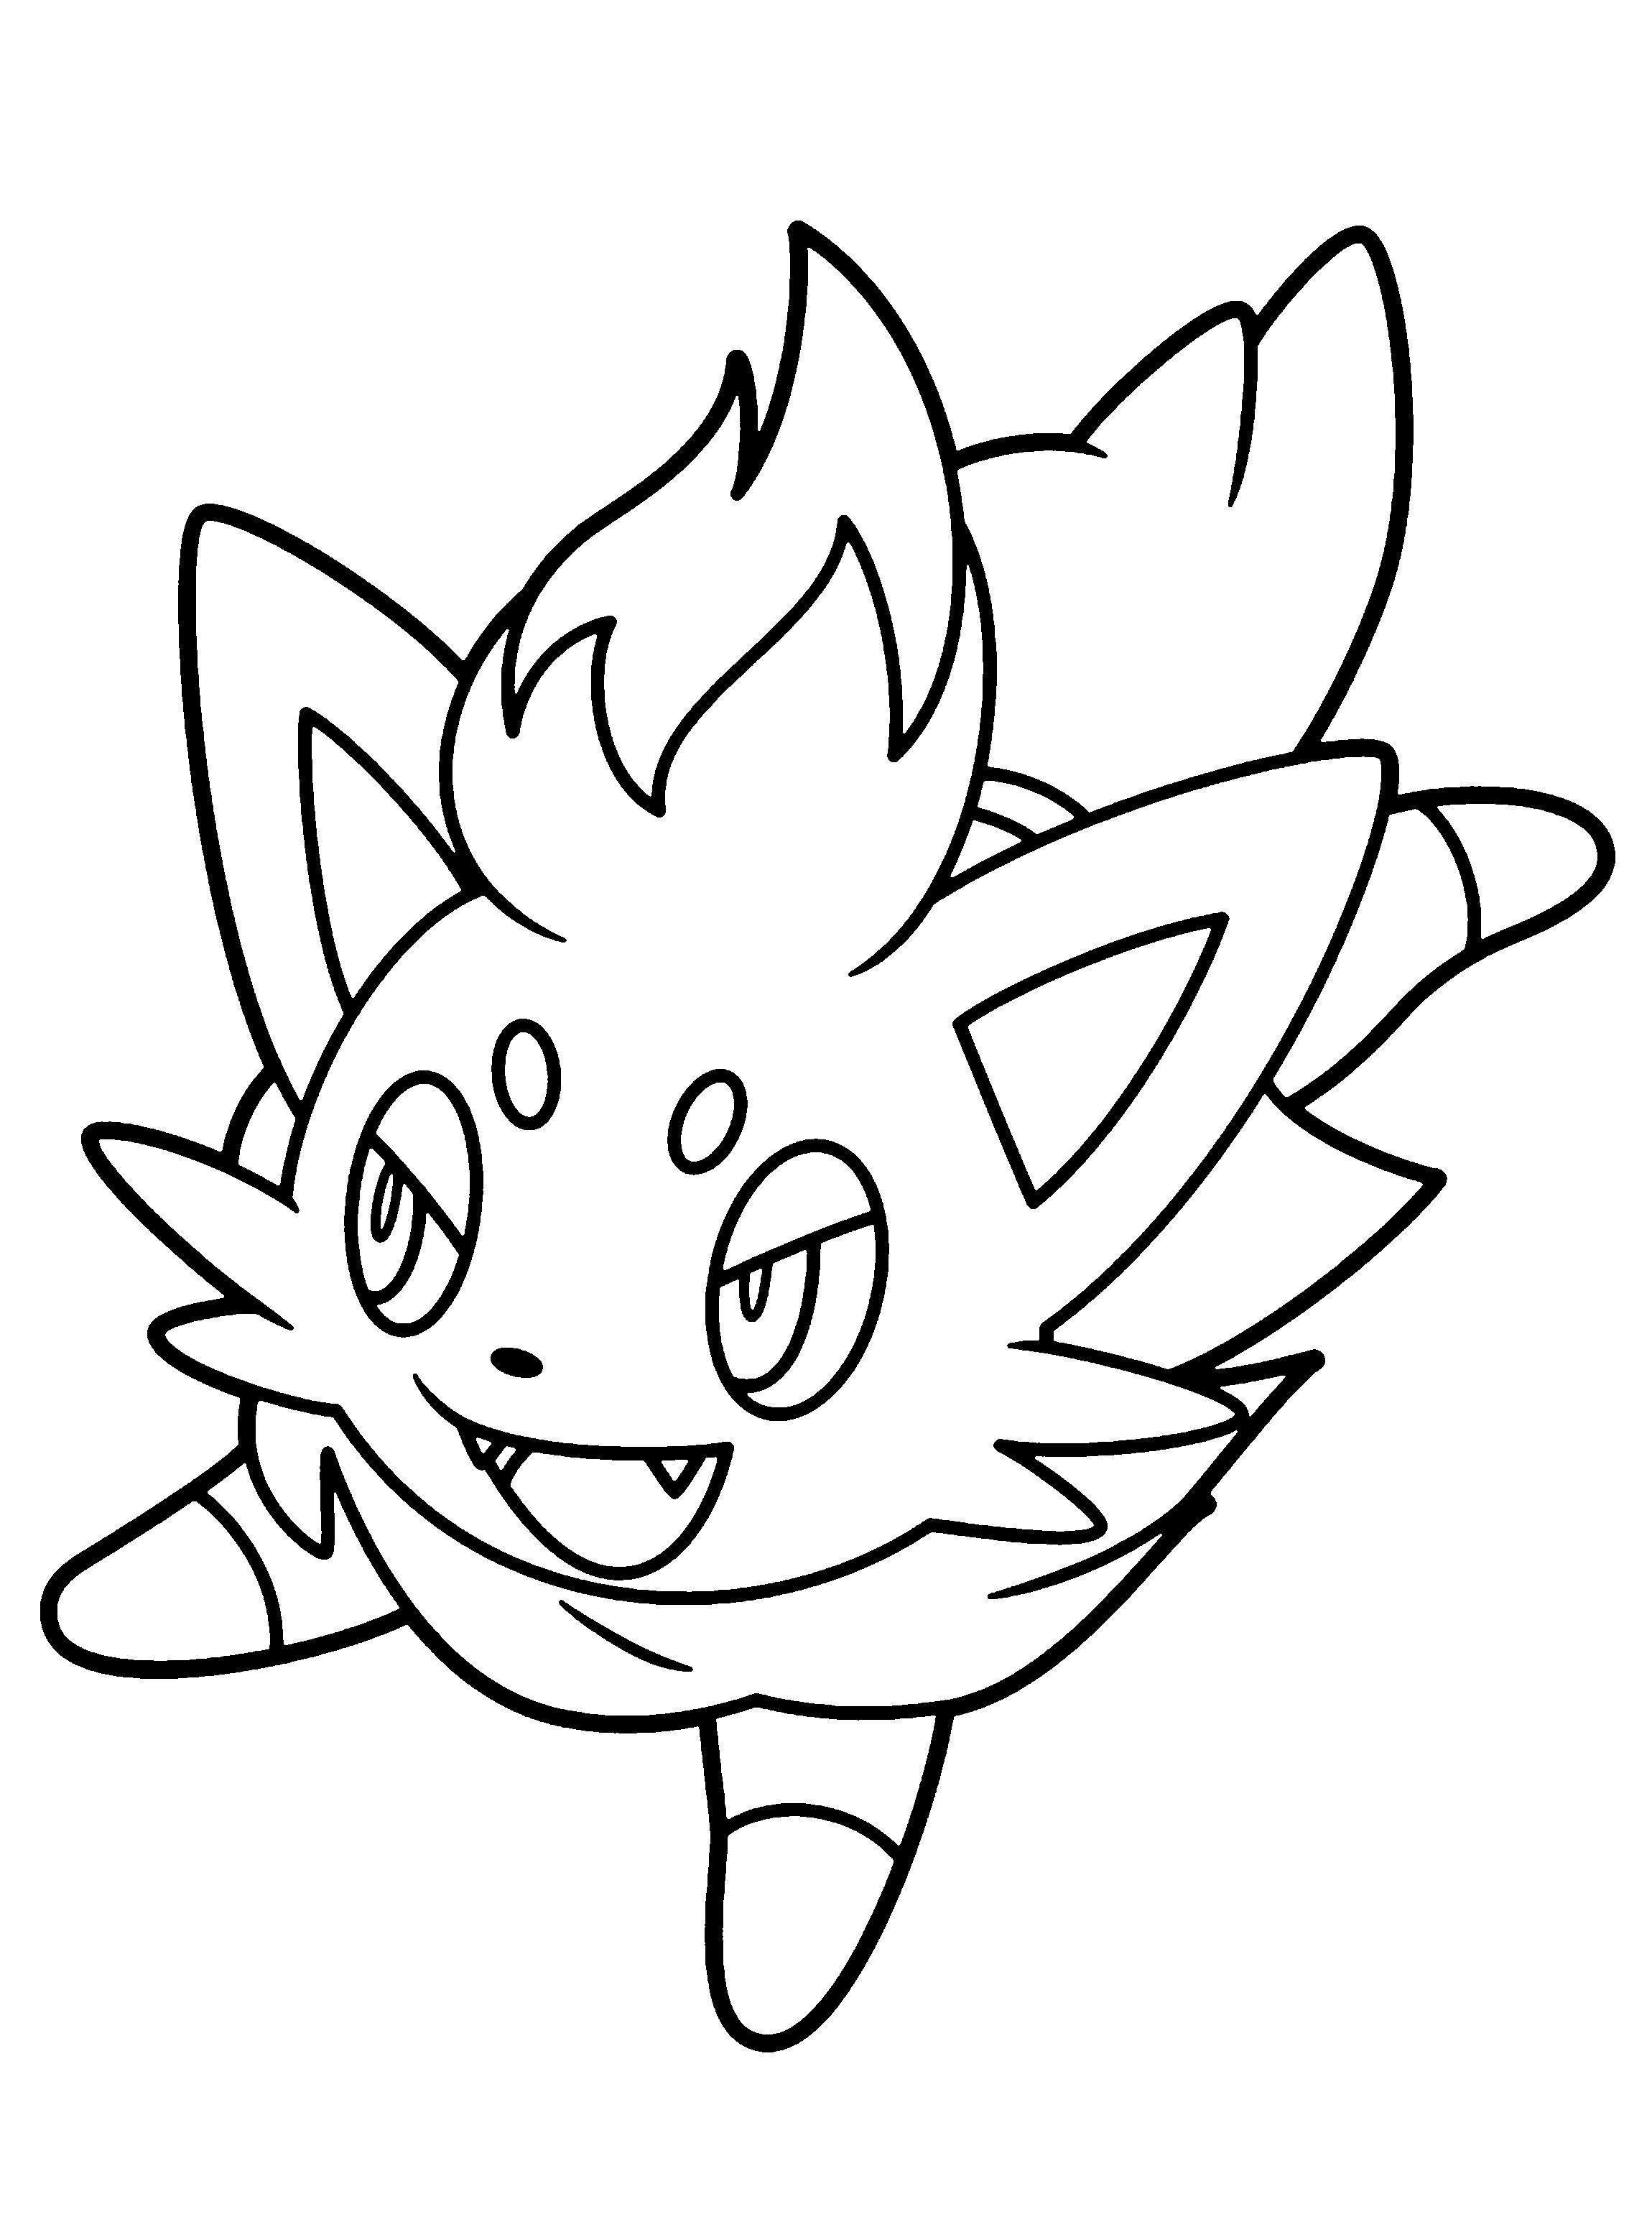 51 Coloriage Pokemon Zorua Imprimer Pokemon Coloring Pokemon Coloring Pages Horse Coloring Pages